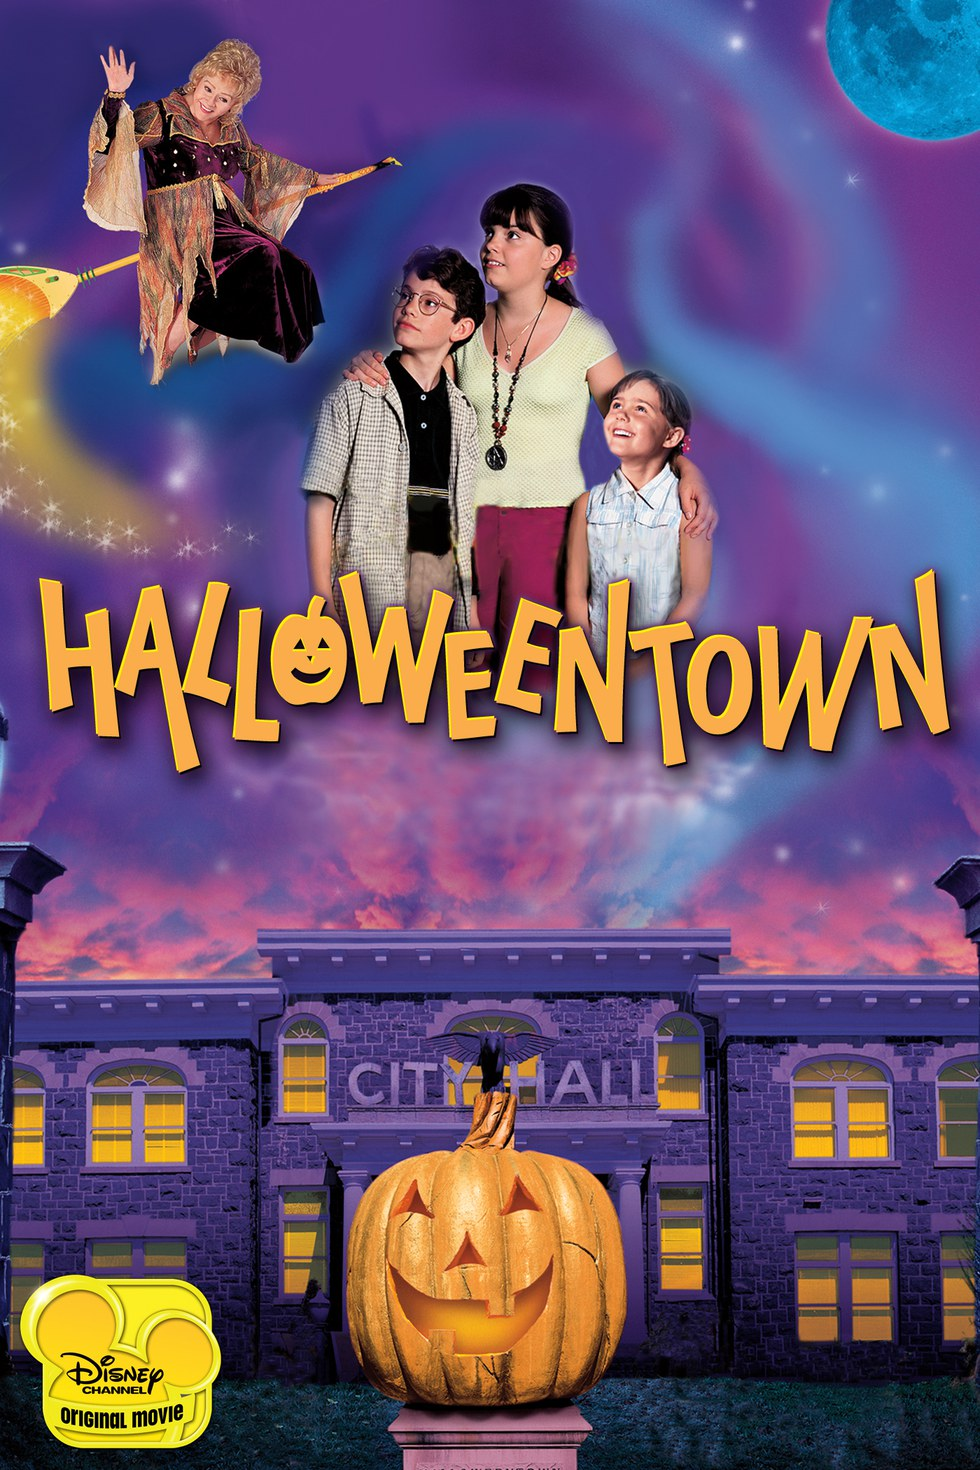 watch halloween 2 15 disney channel halloween movies you should watch - Watch Halloween 5 Online Free Full Movie